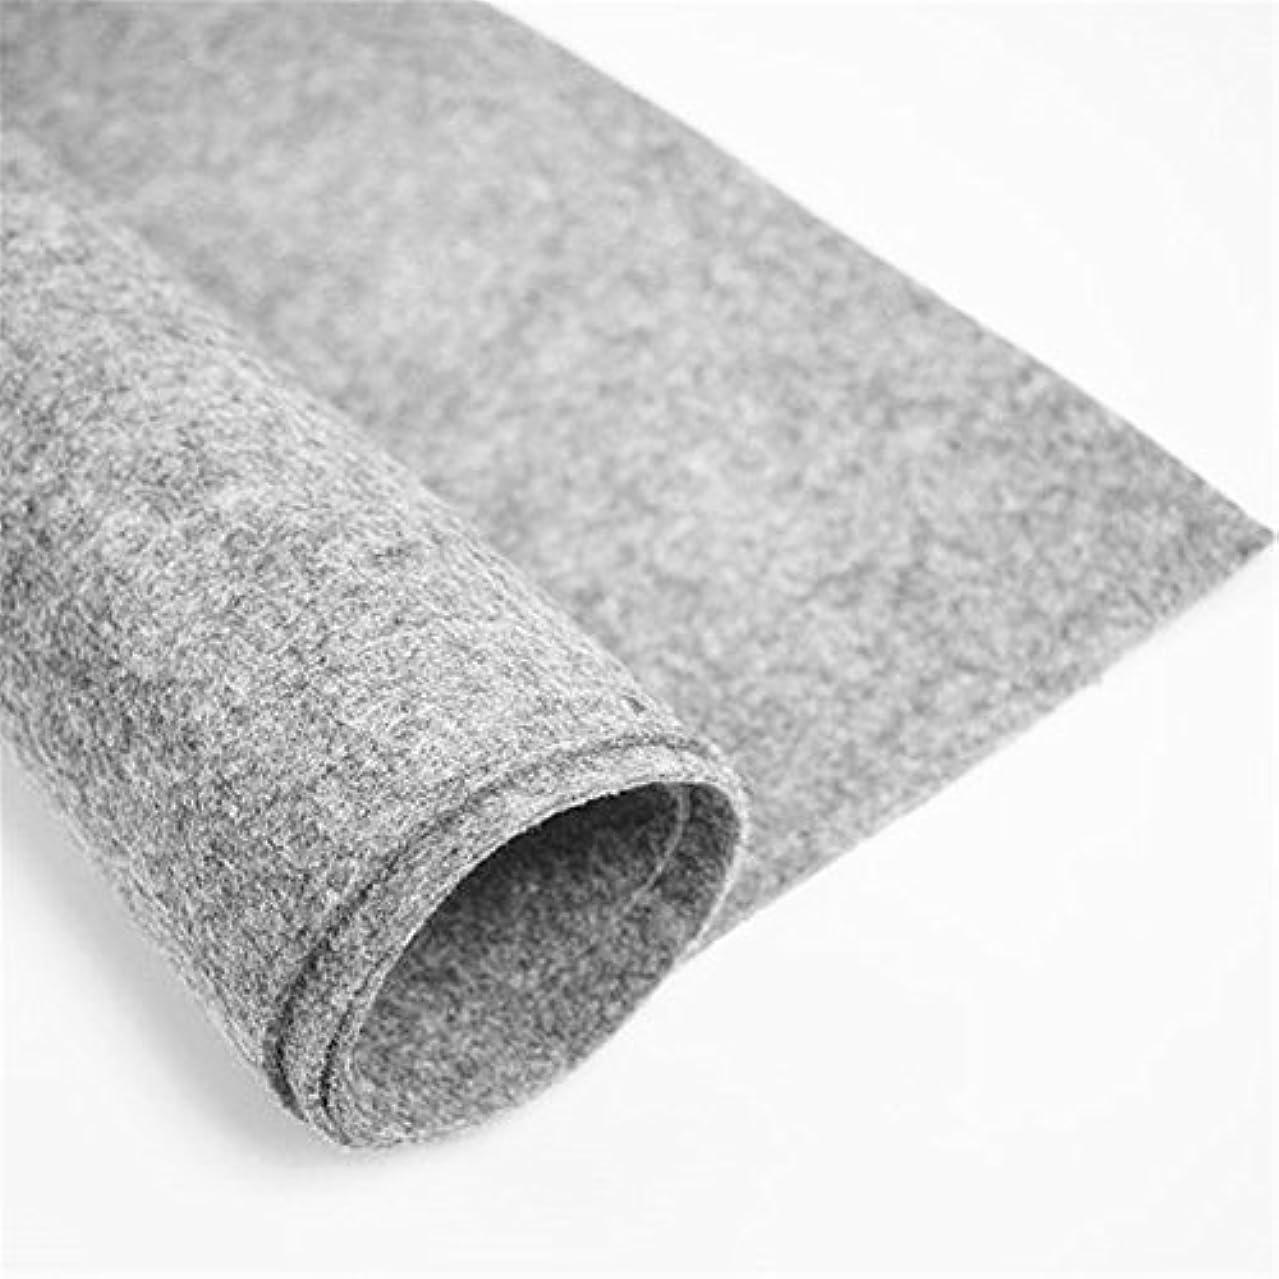 Felt Fabric 3 mm Thick, Light Grey Craft Felt Cloth Non-Woven Wool Felt Fabric Sold by The Yard (3 mm Thick, Light Grey)